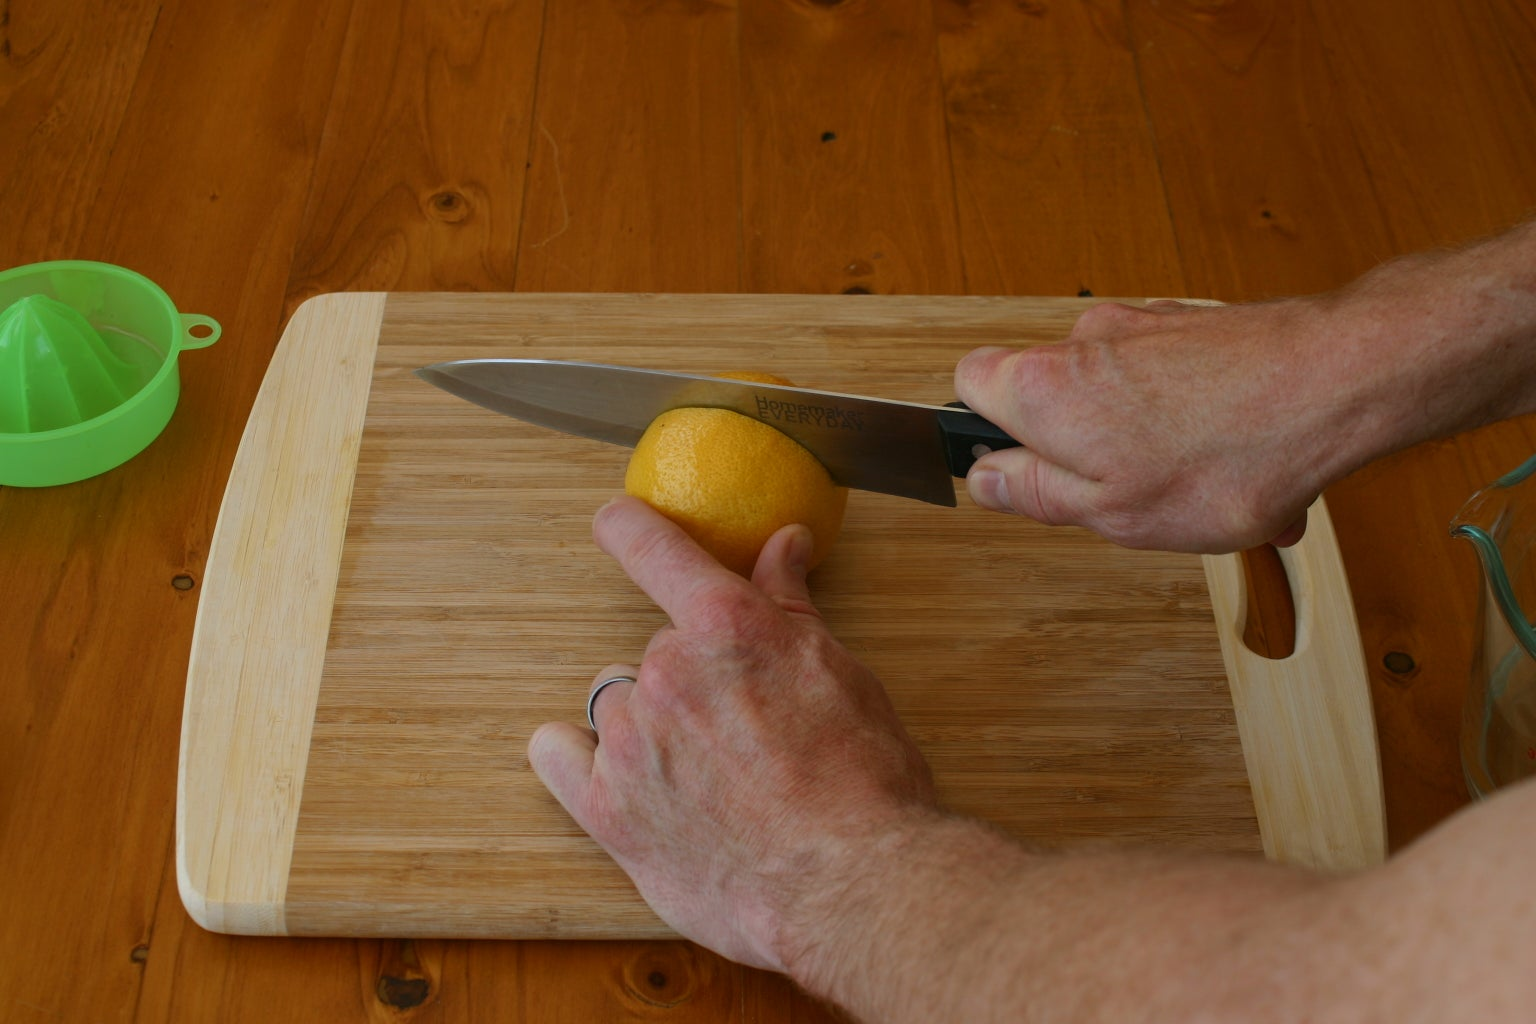 Cut the Lemon